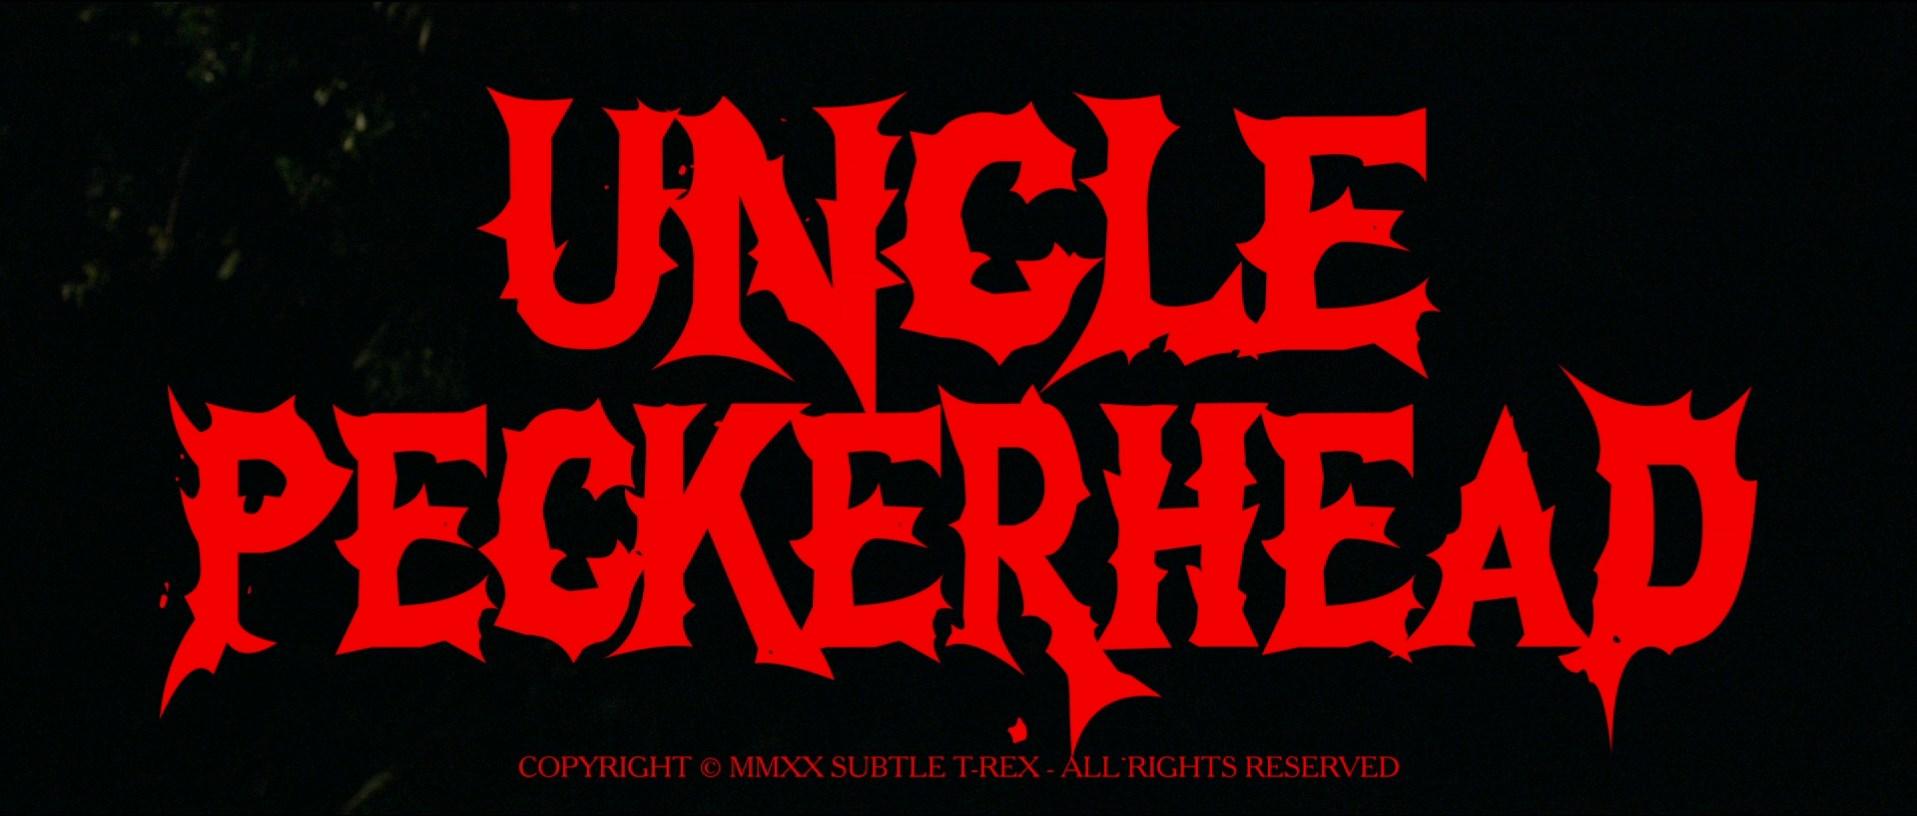 Uncle Peckerhead (2020) 1080p WEB-DL AMZN